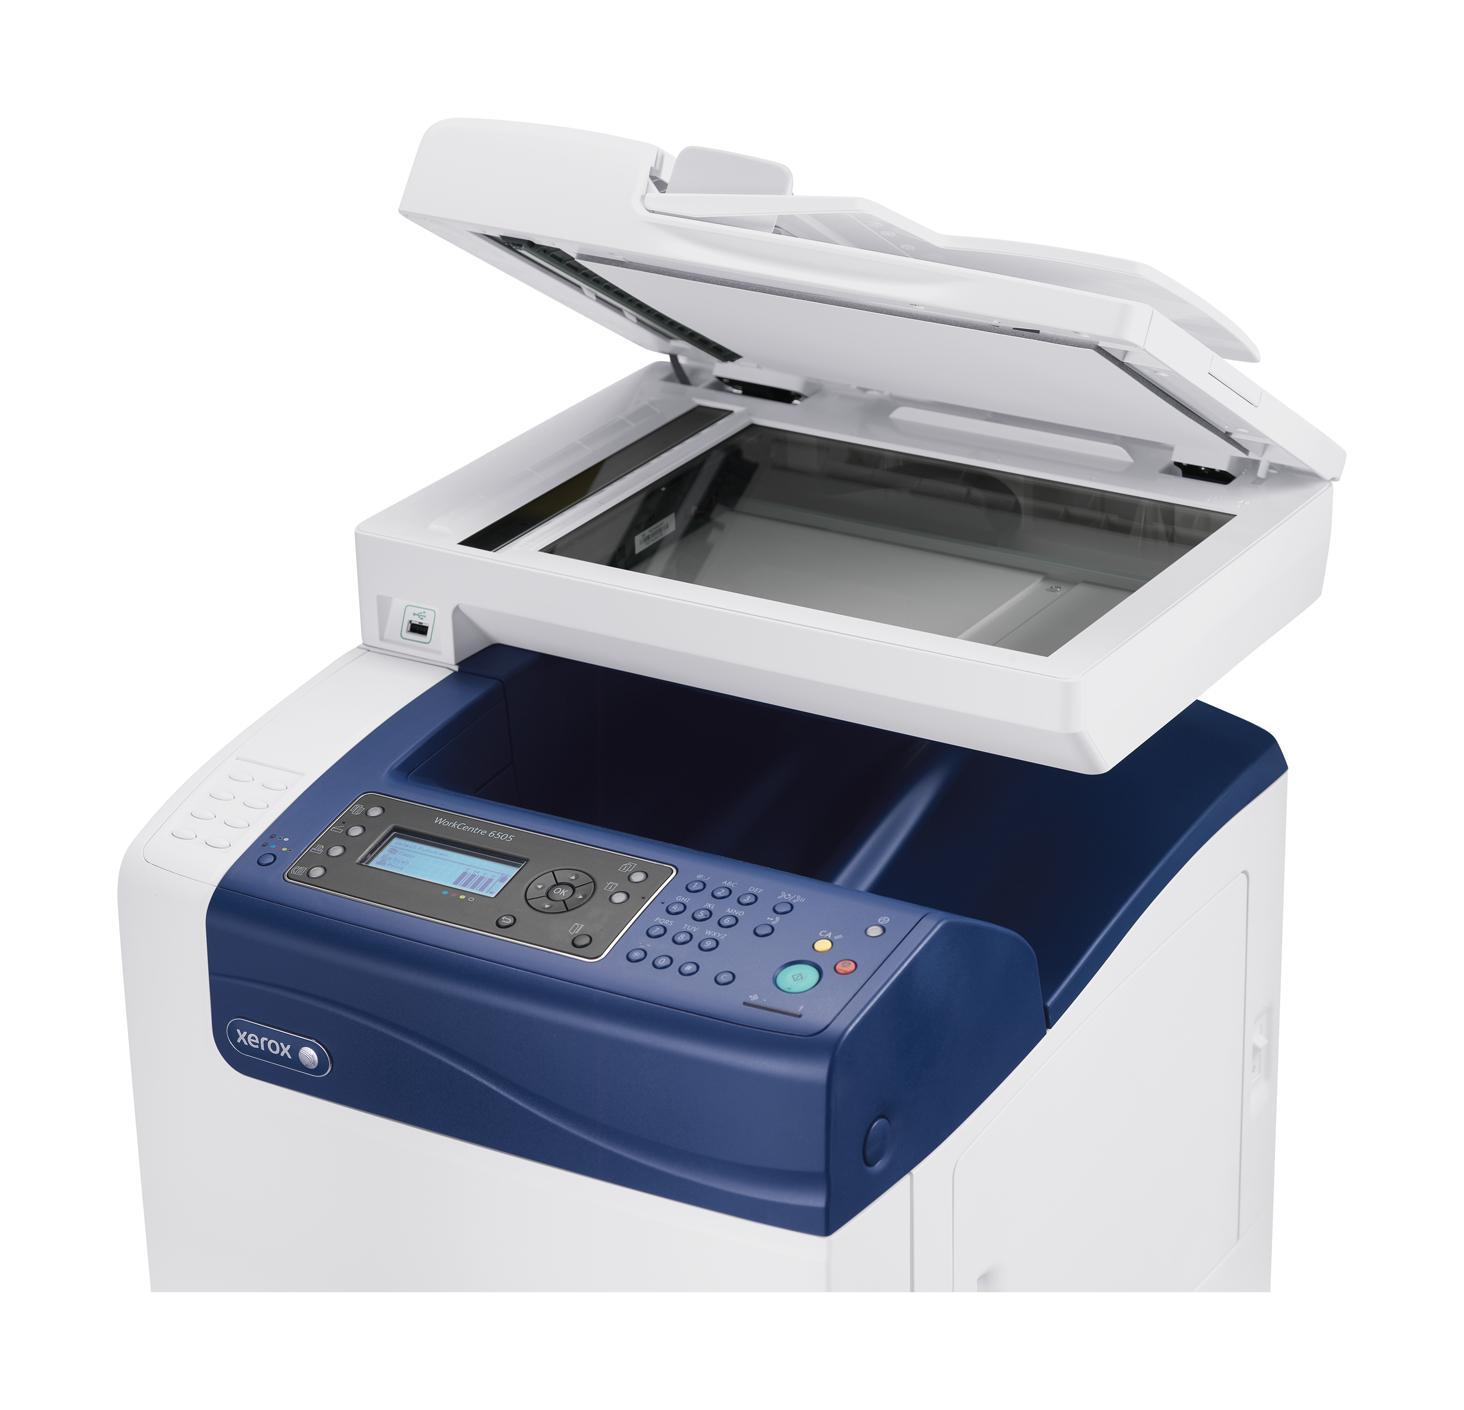 Amazon.com : Xerox WorkCentre 6505/DN Color Multifunction